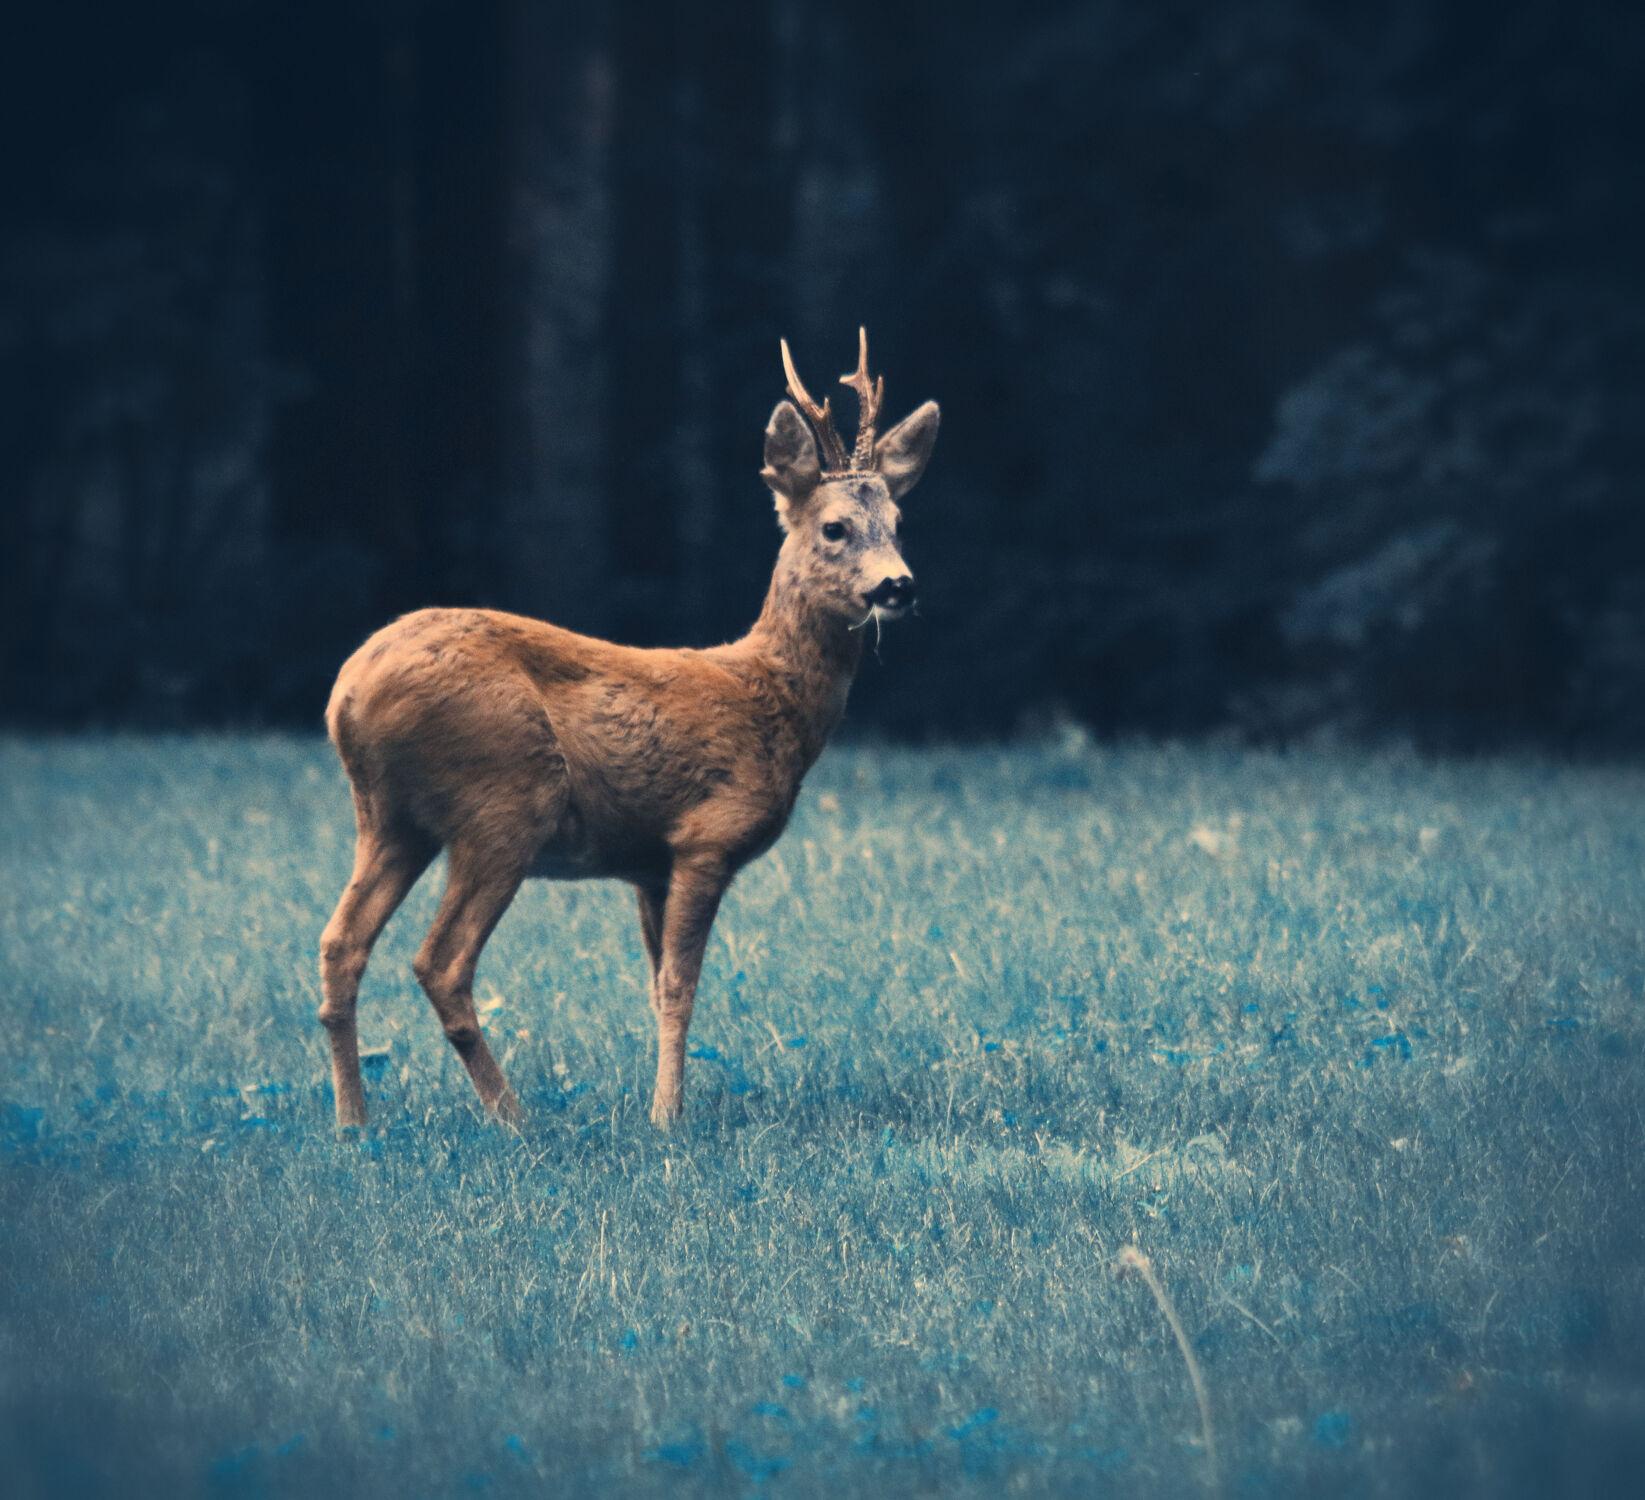 Bild mit Natur, Tier, Animal, Reh